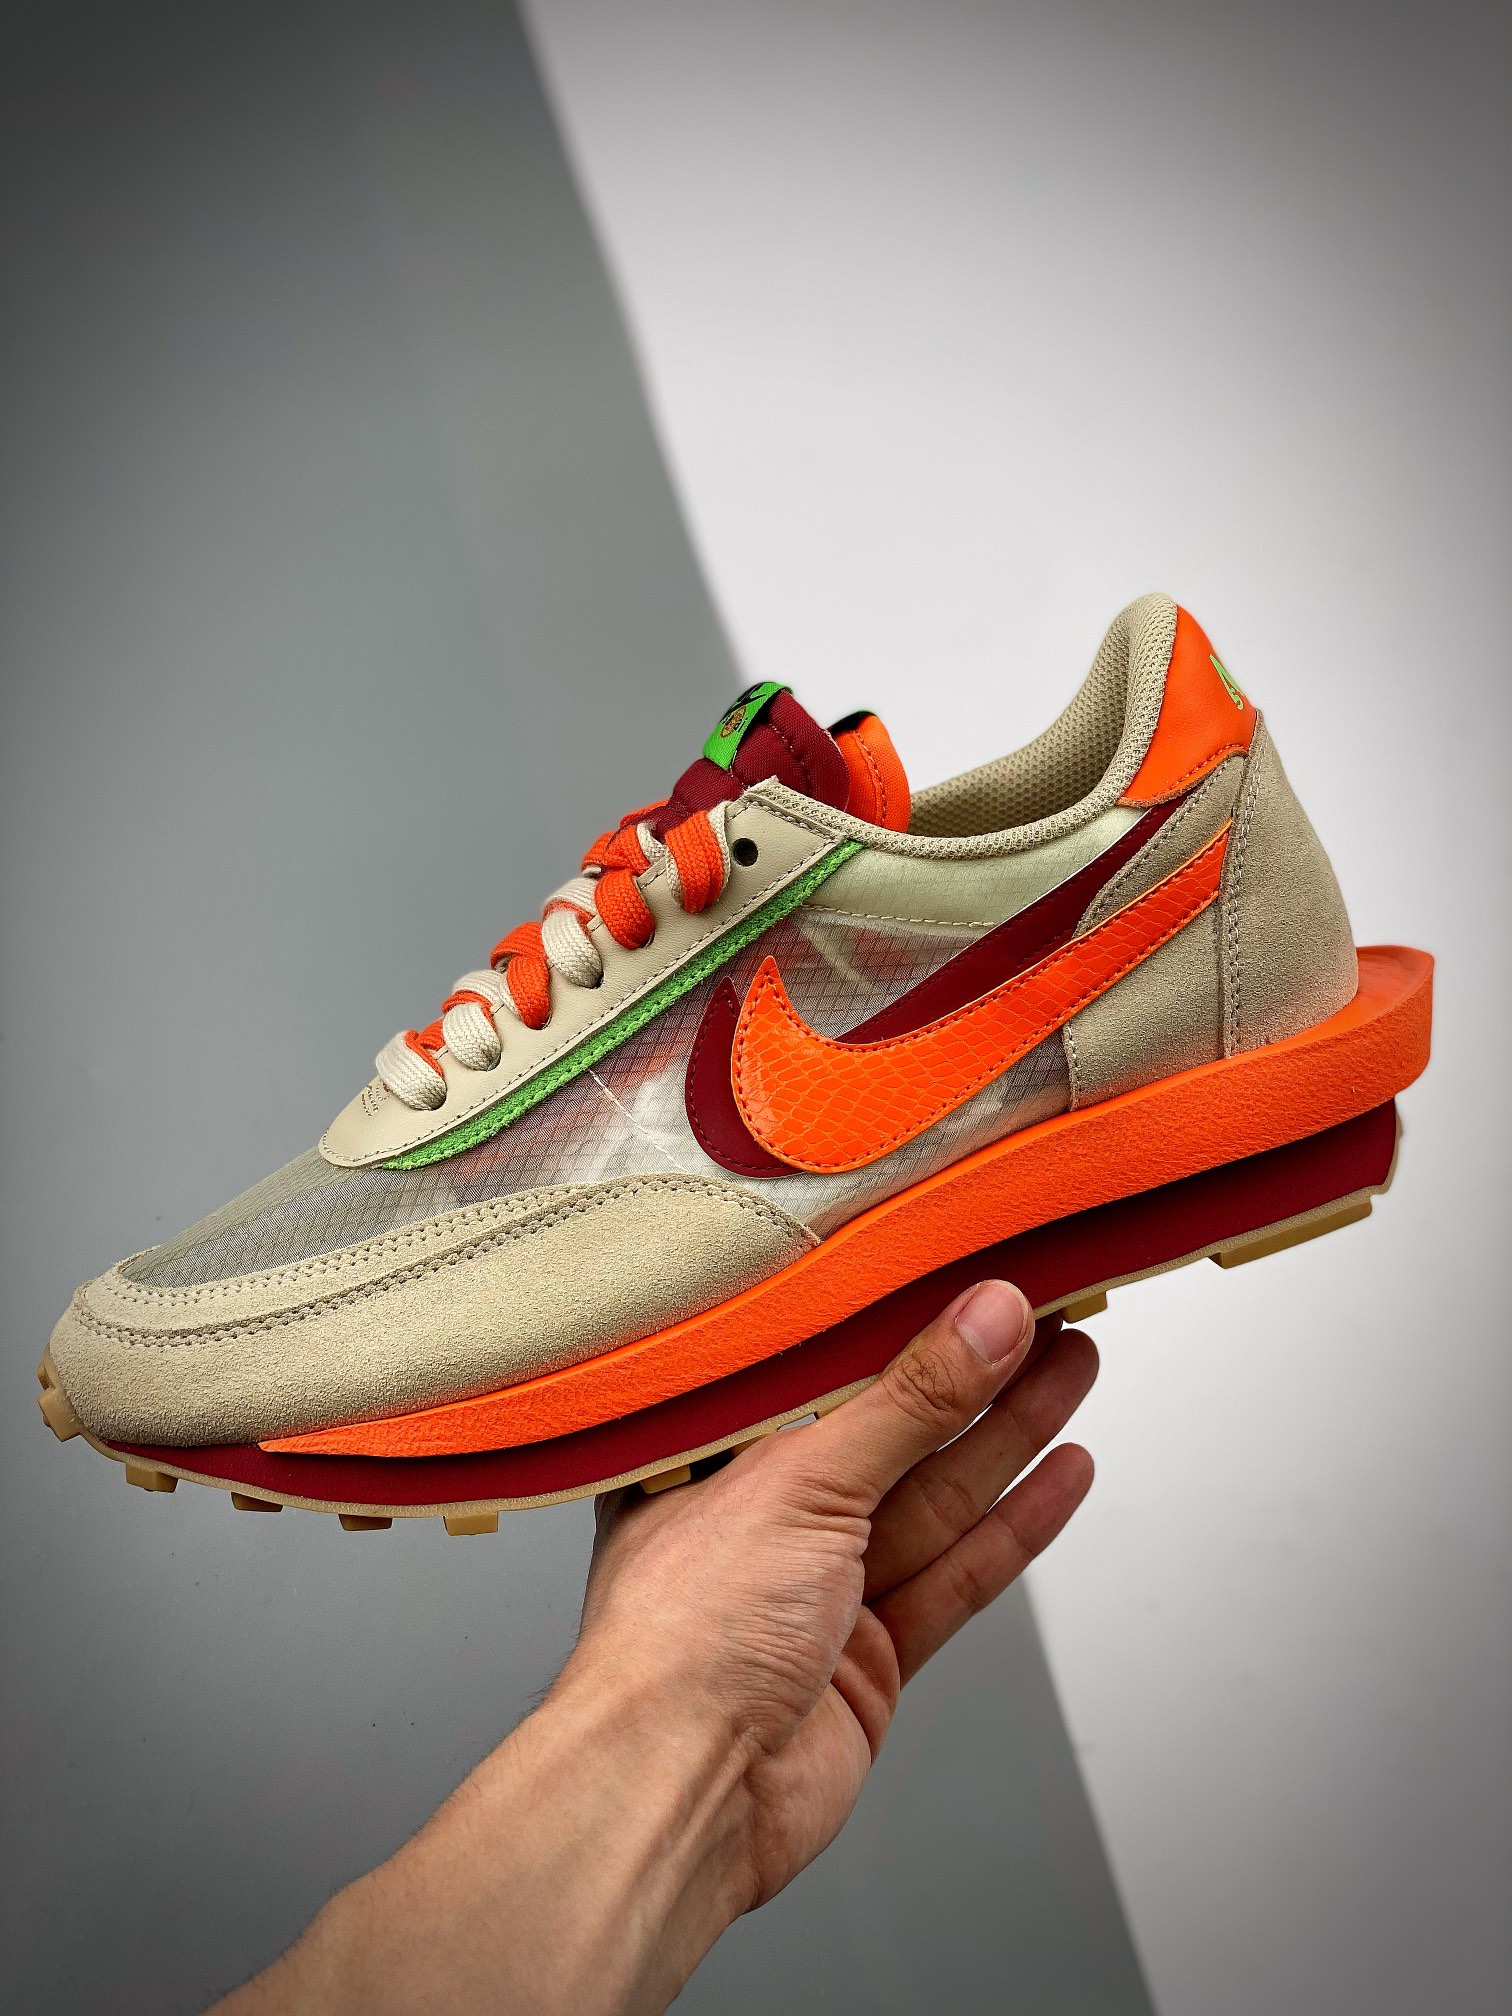 "S2纯原版本 CLOT x Sacai x NK LDWaffle ""Net Orange Blaze"" 联名重叠设计前卫华夫变形""米橙配色""休闲慢跑鞋 DH1"